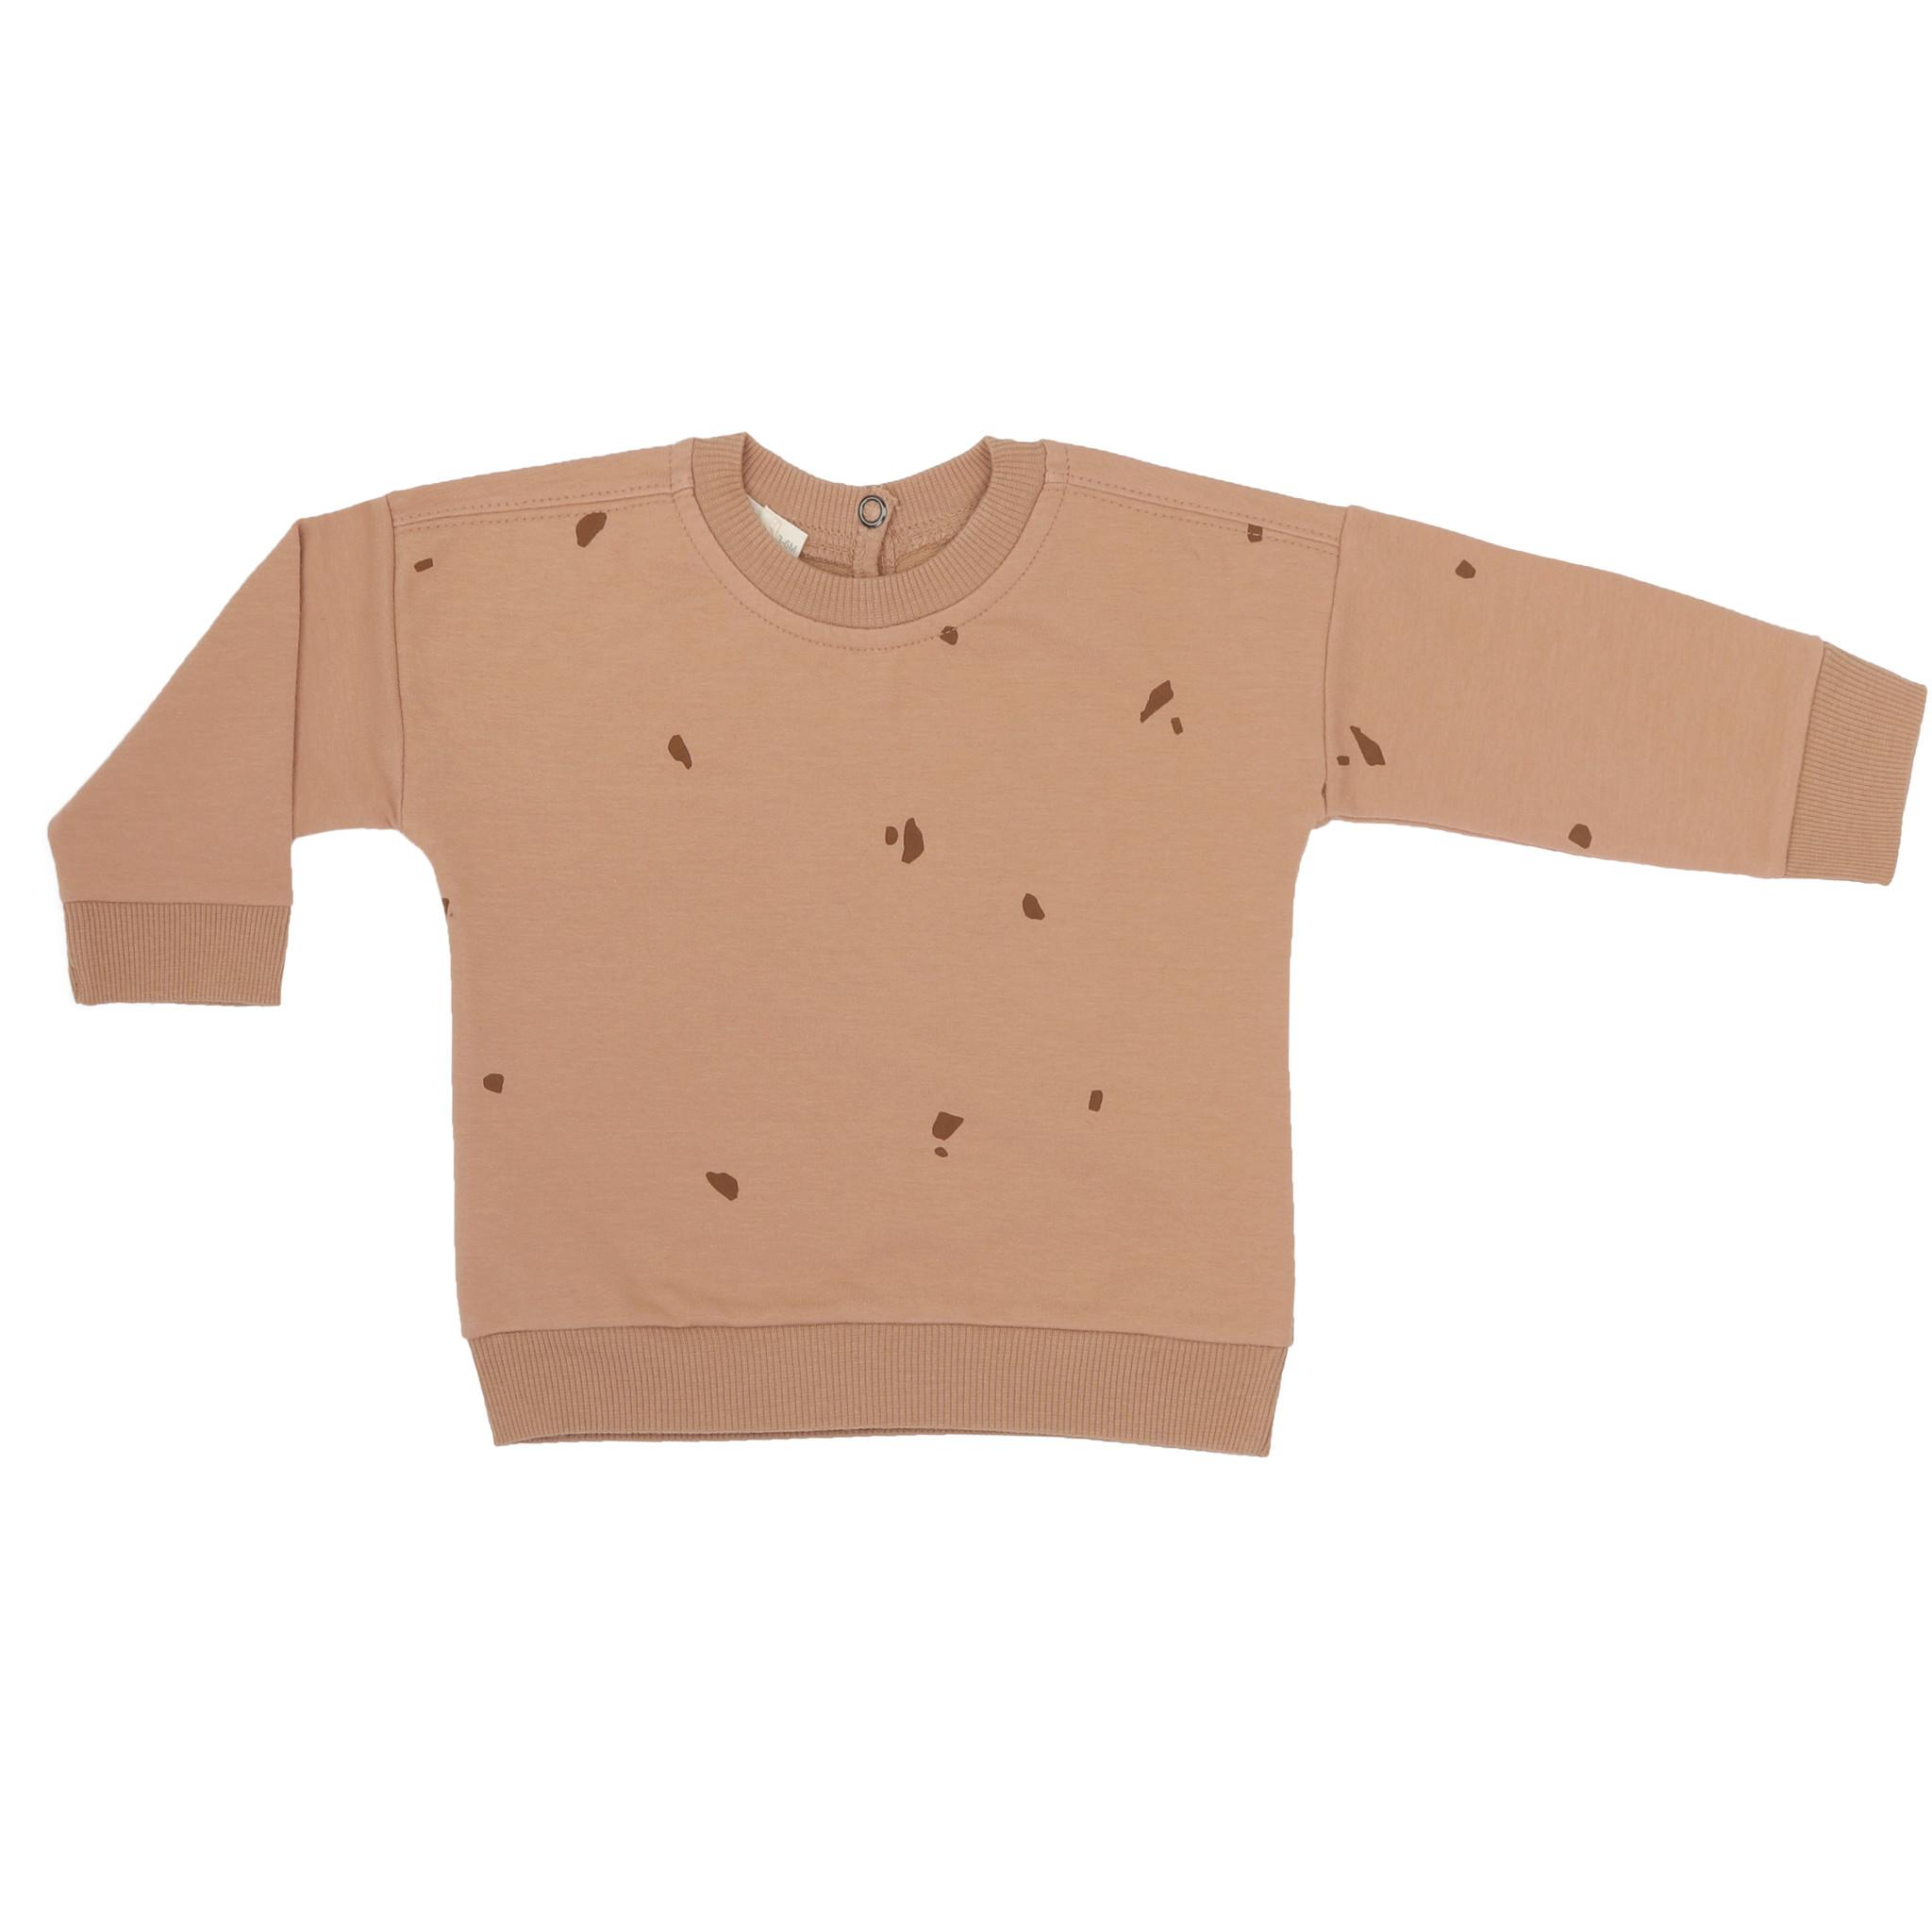 Baby summer sweater stones - warm biscuit-1